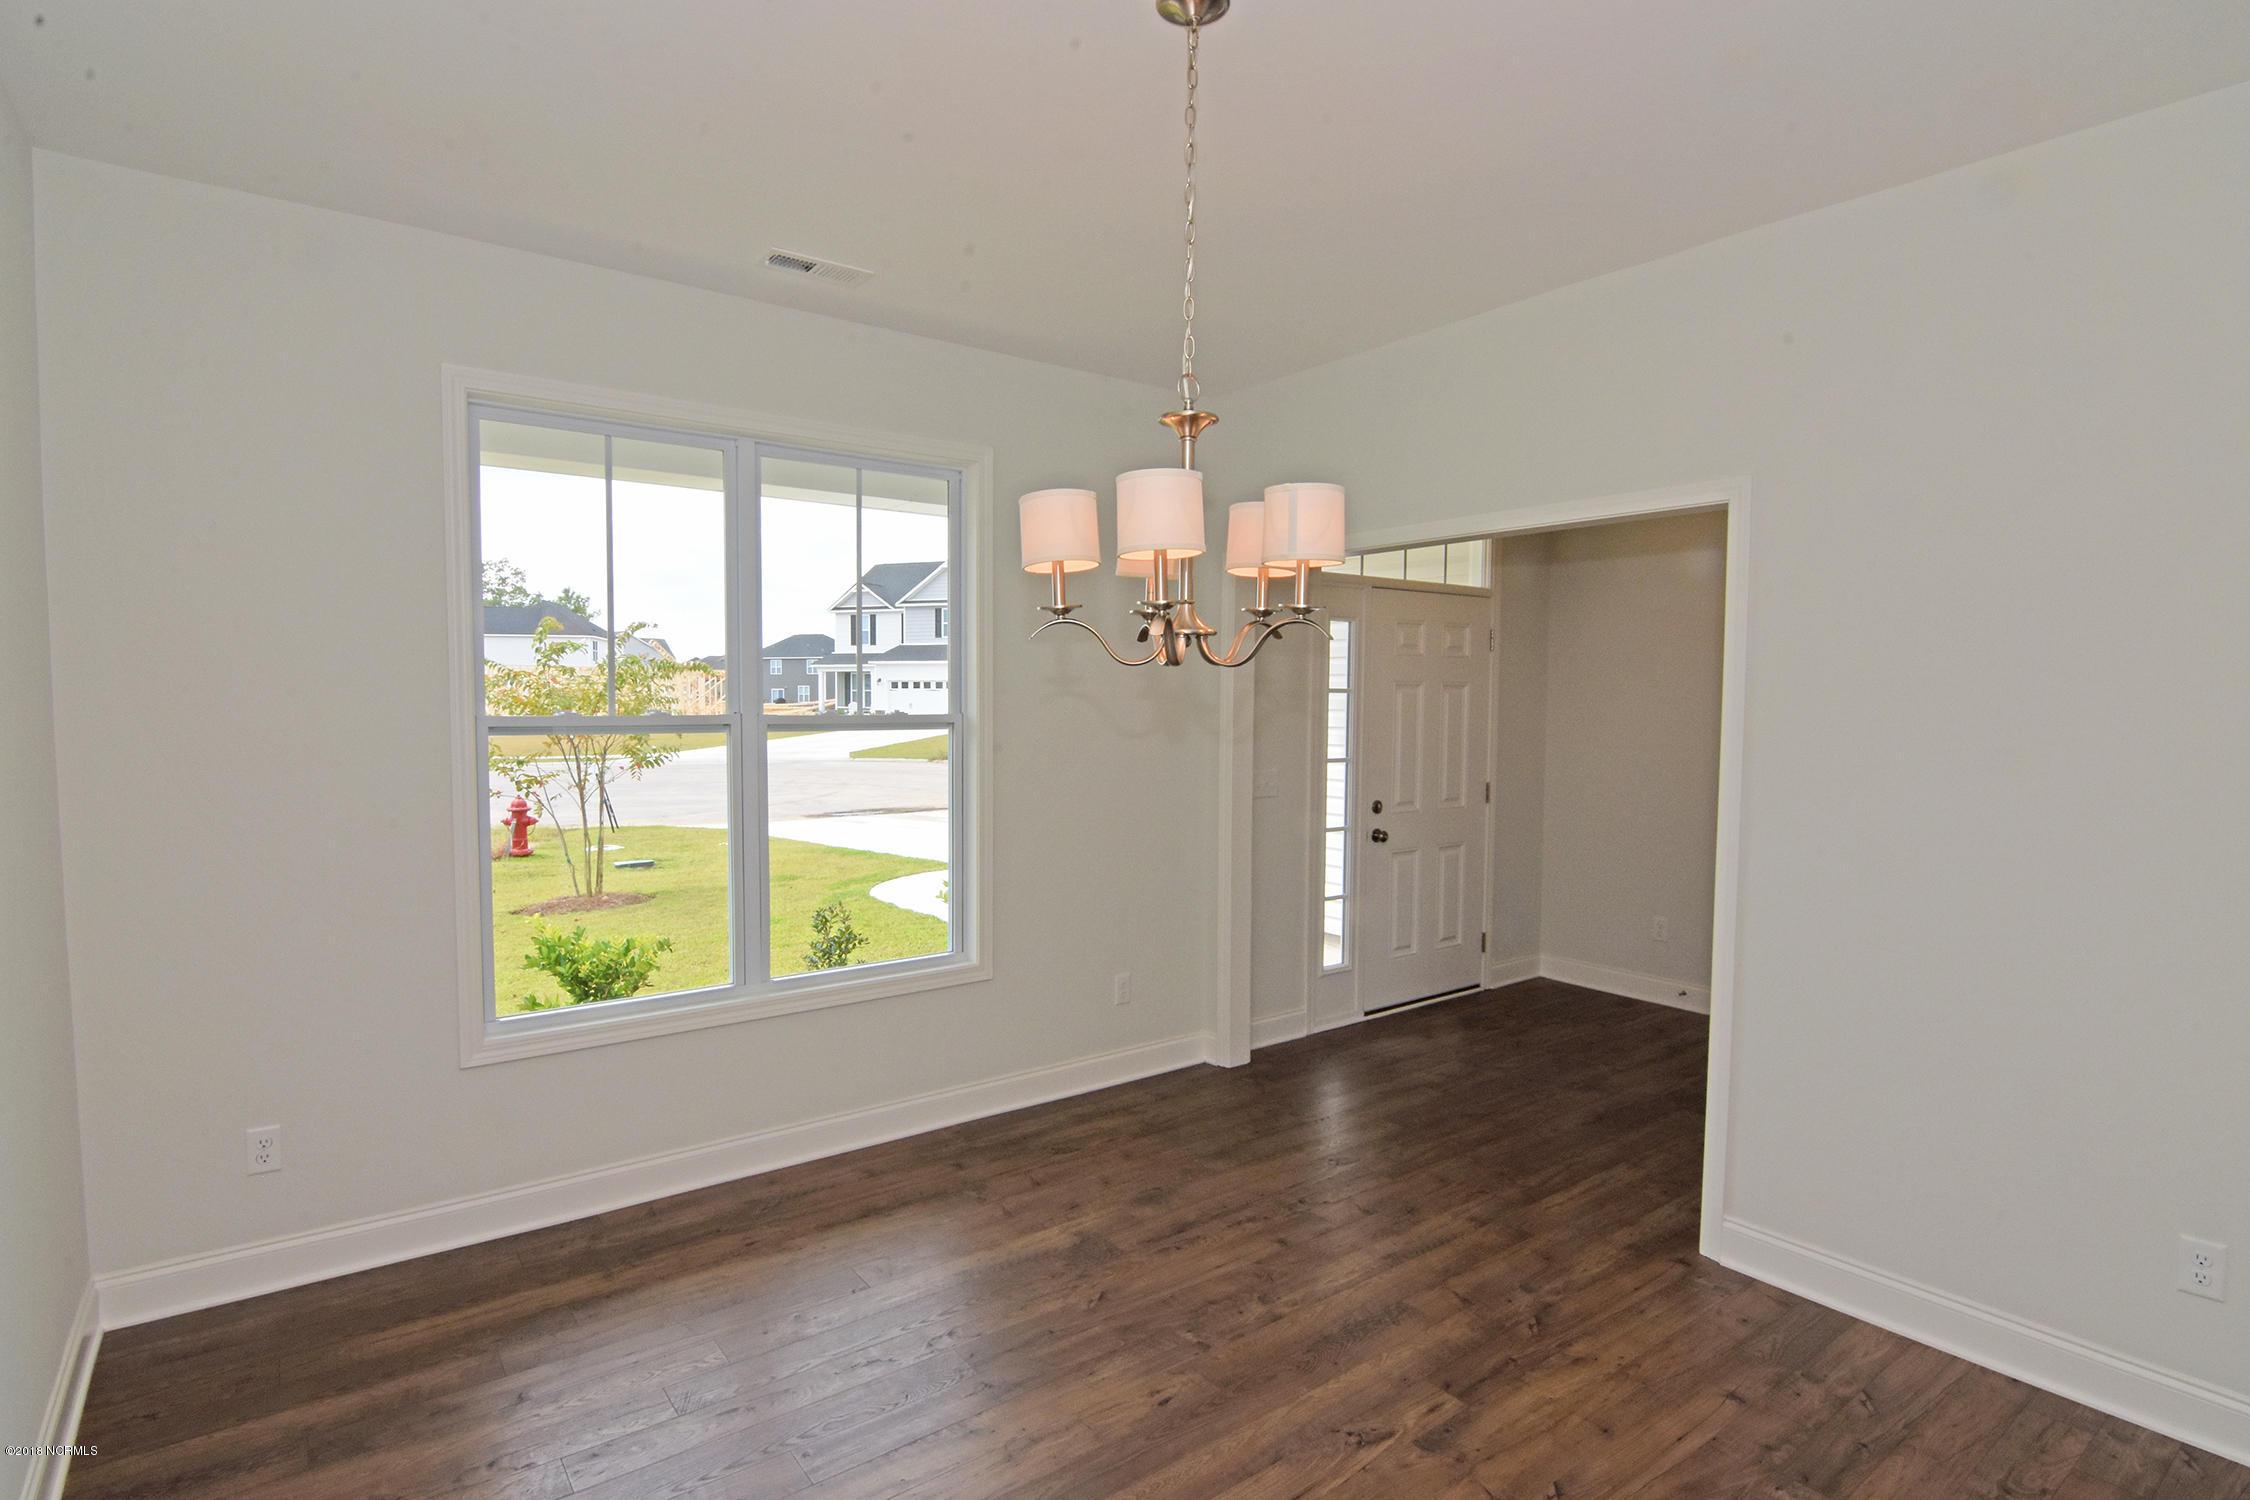 1230 Needleleaf Drive, Winnabow, North Carolina, 3 Bedrooms Bedrooms, 7 Rooms Rooms,2 BathroomsBathrooms,Single family residence,For sale,Needleleaf,100106001